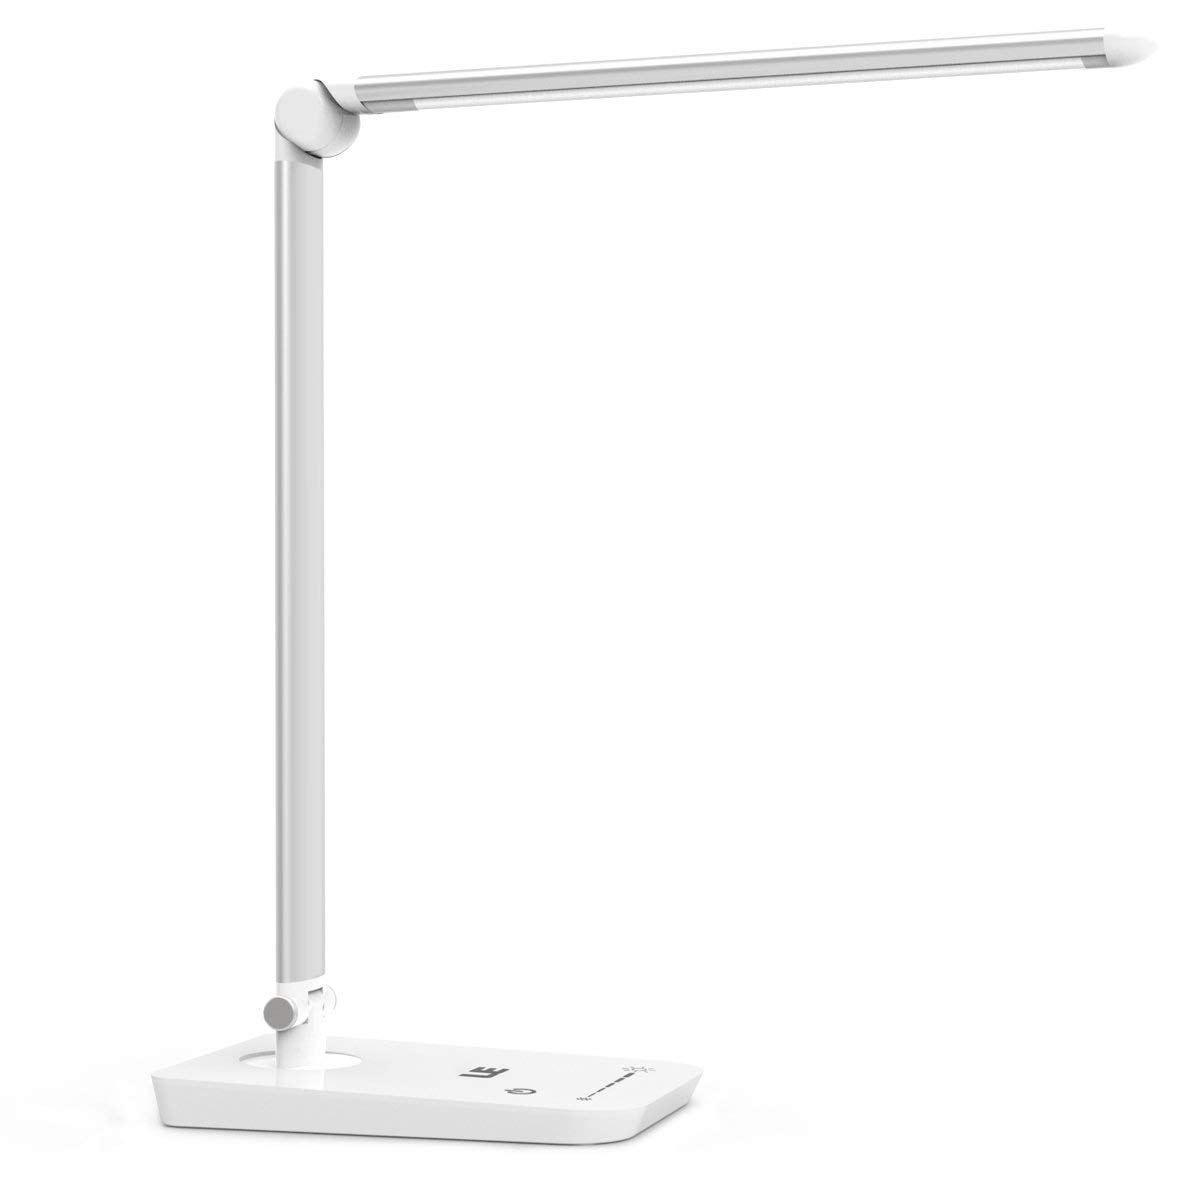 Le 8w Daylight Desk Lamp Dimmable 7 Level Brightness Led inside measurements 1200 X 1200